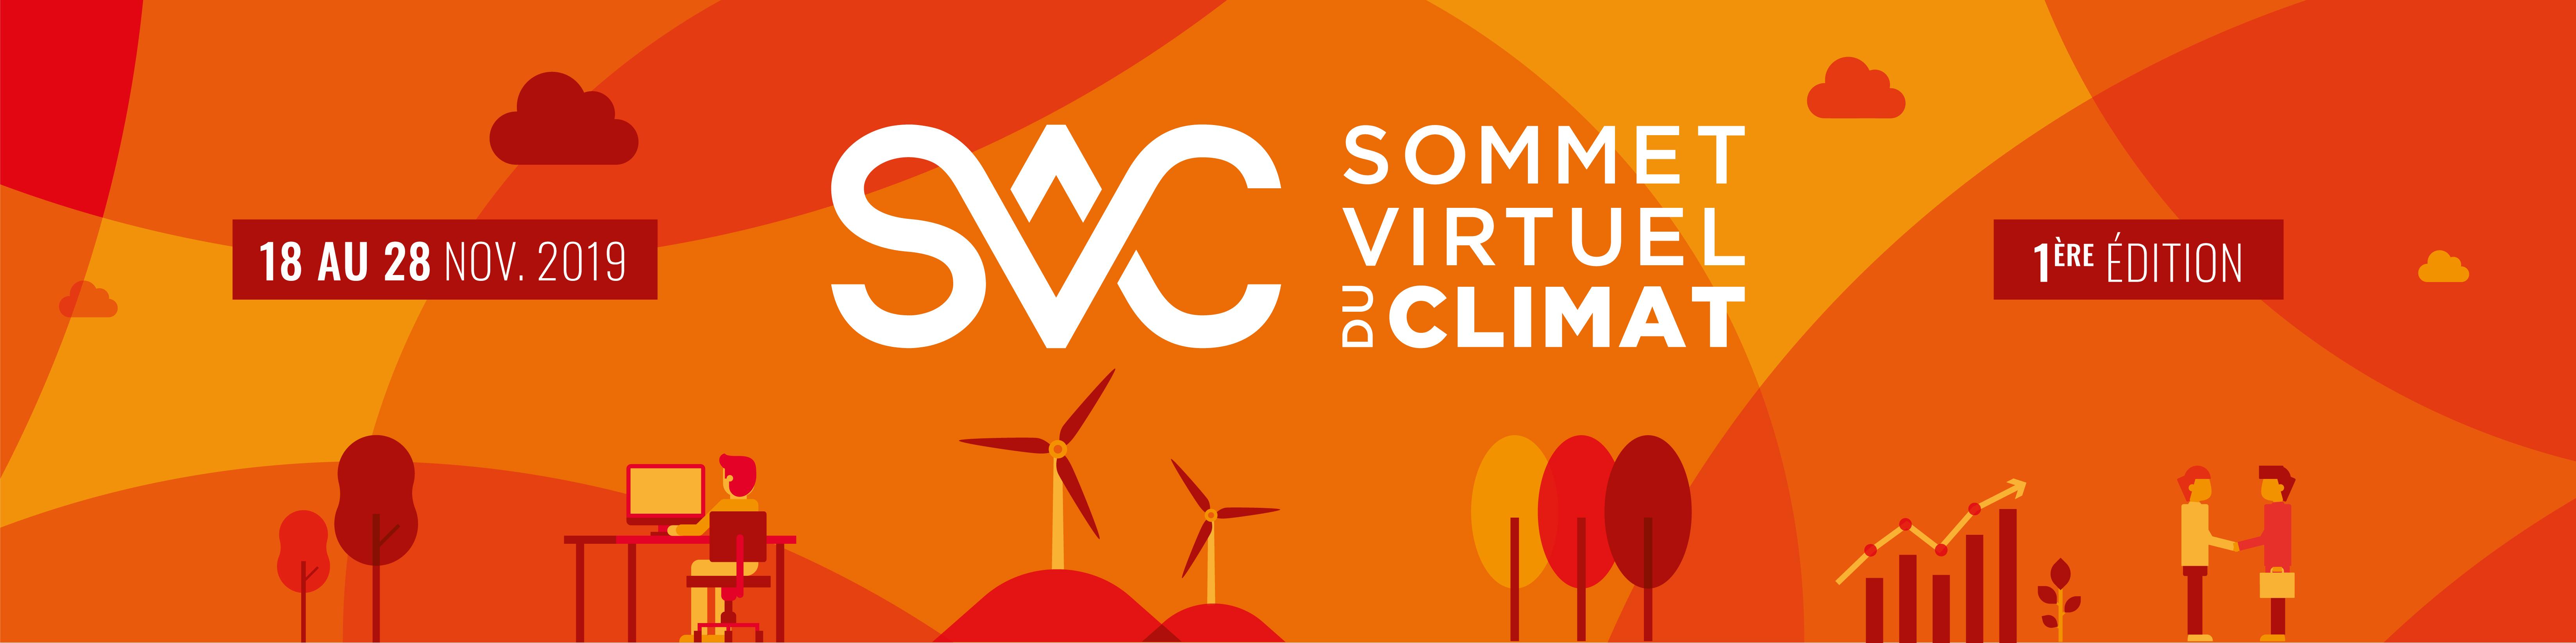 SVC_Charte